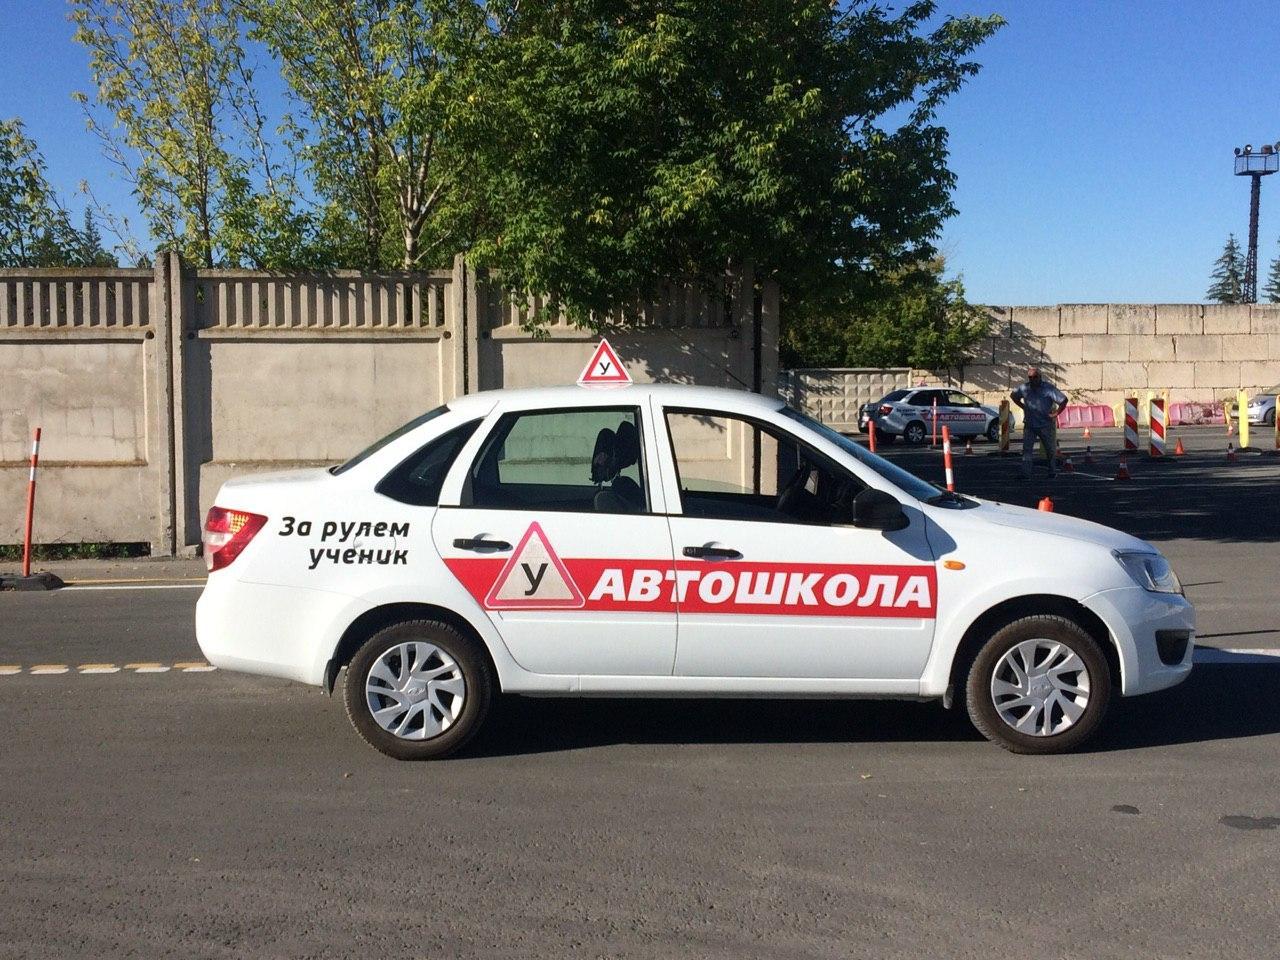 В Белогорске построили автодром за 7 млн рублей